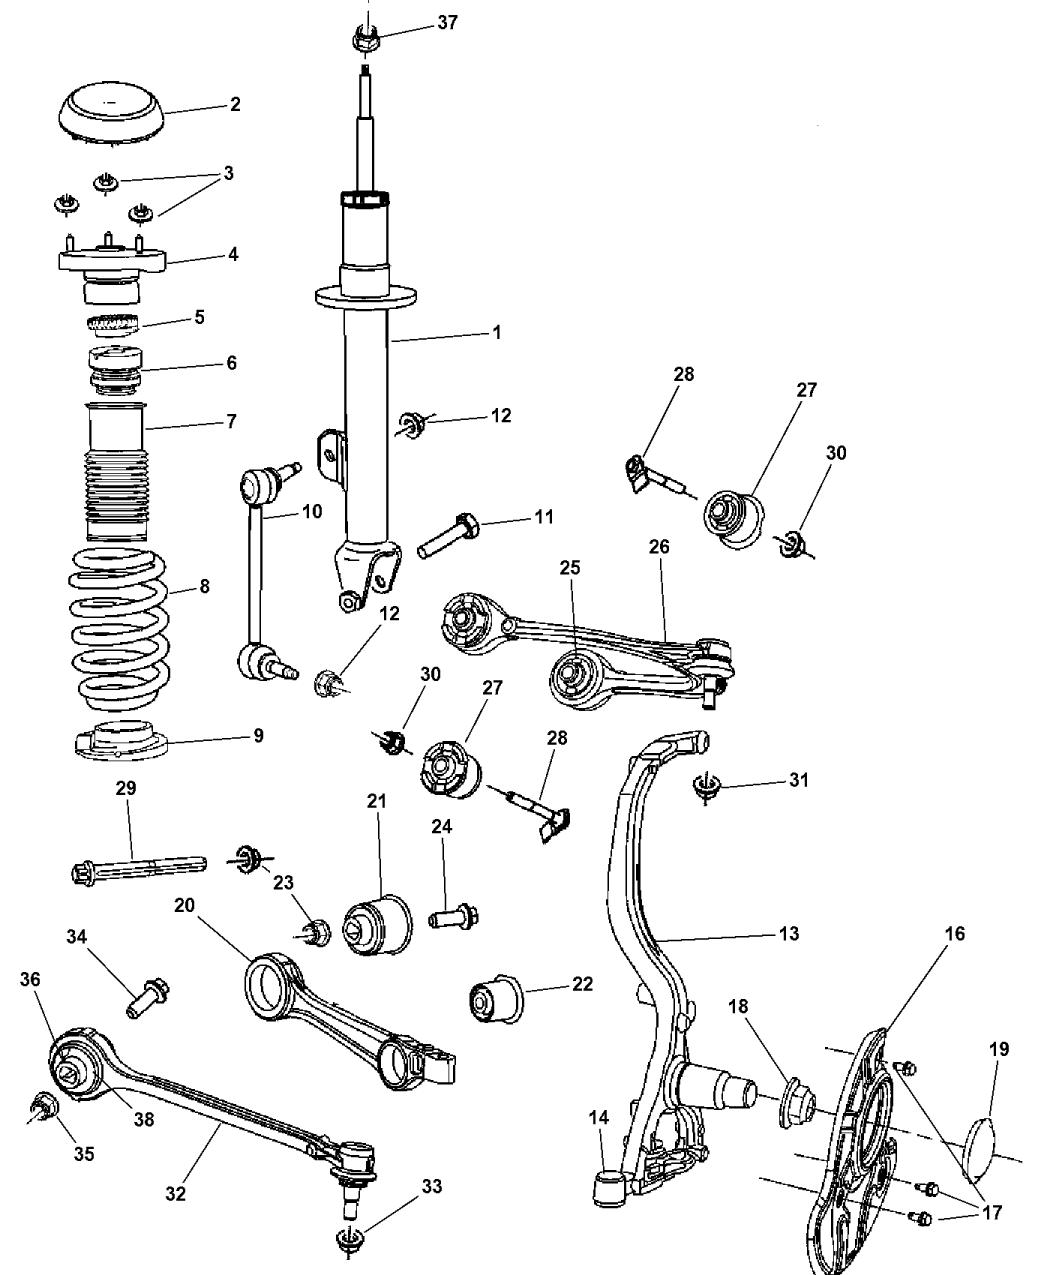 2006 Chrysler 300 Front Suspension Diagram